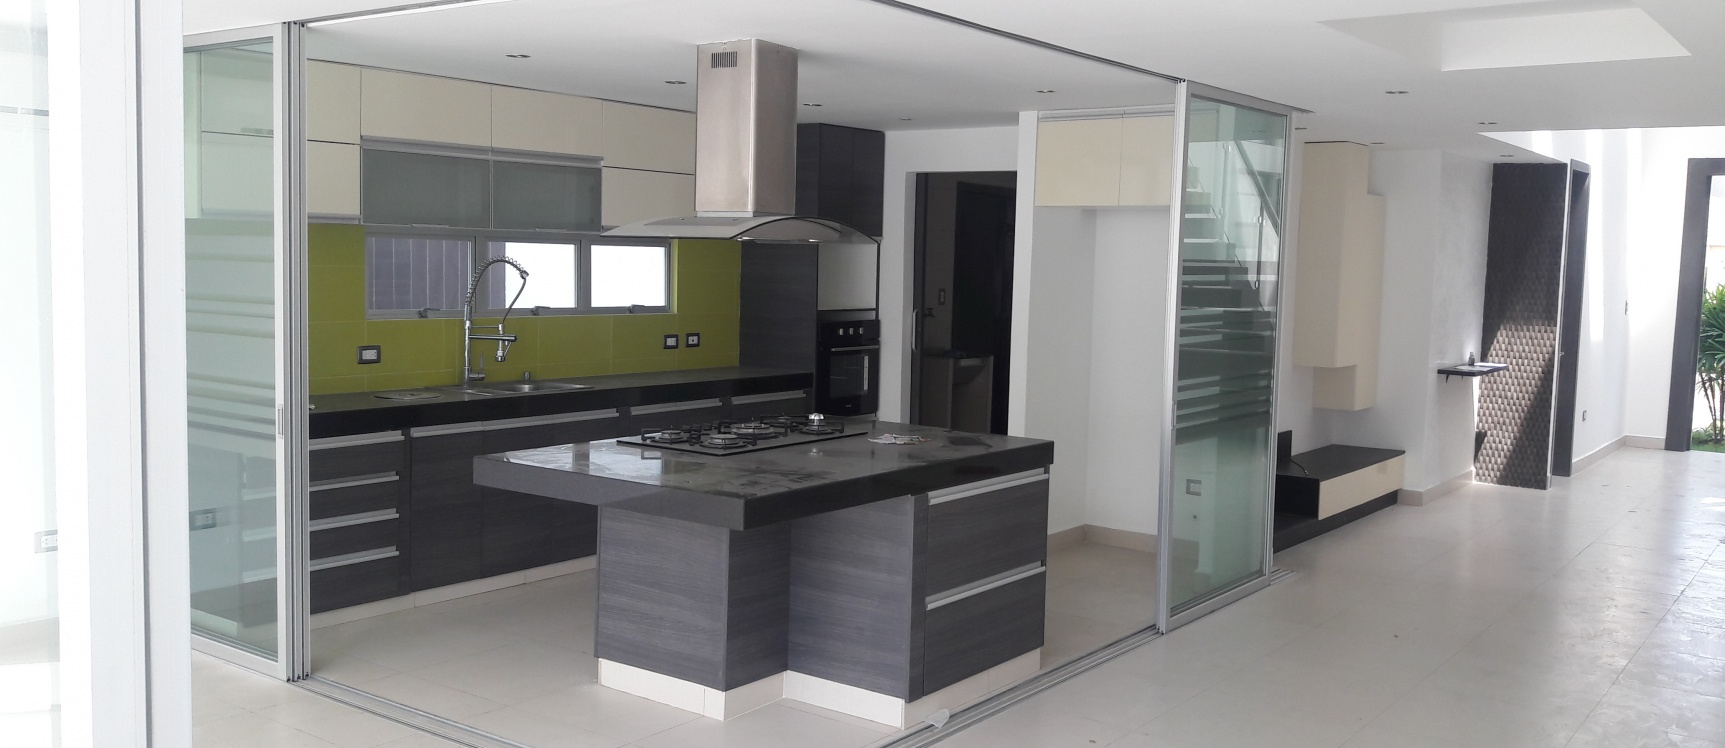 Alquilo casa en urb terrasol samborondon geobienes for Casa minimalista guayaquil